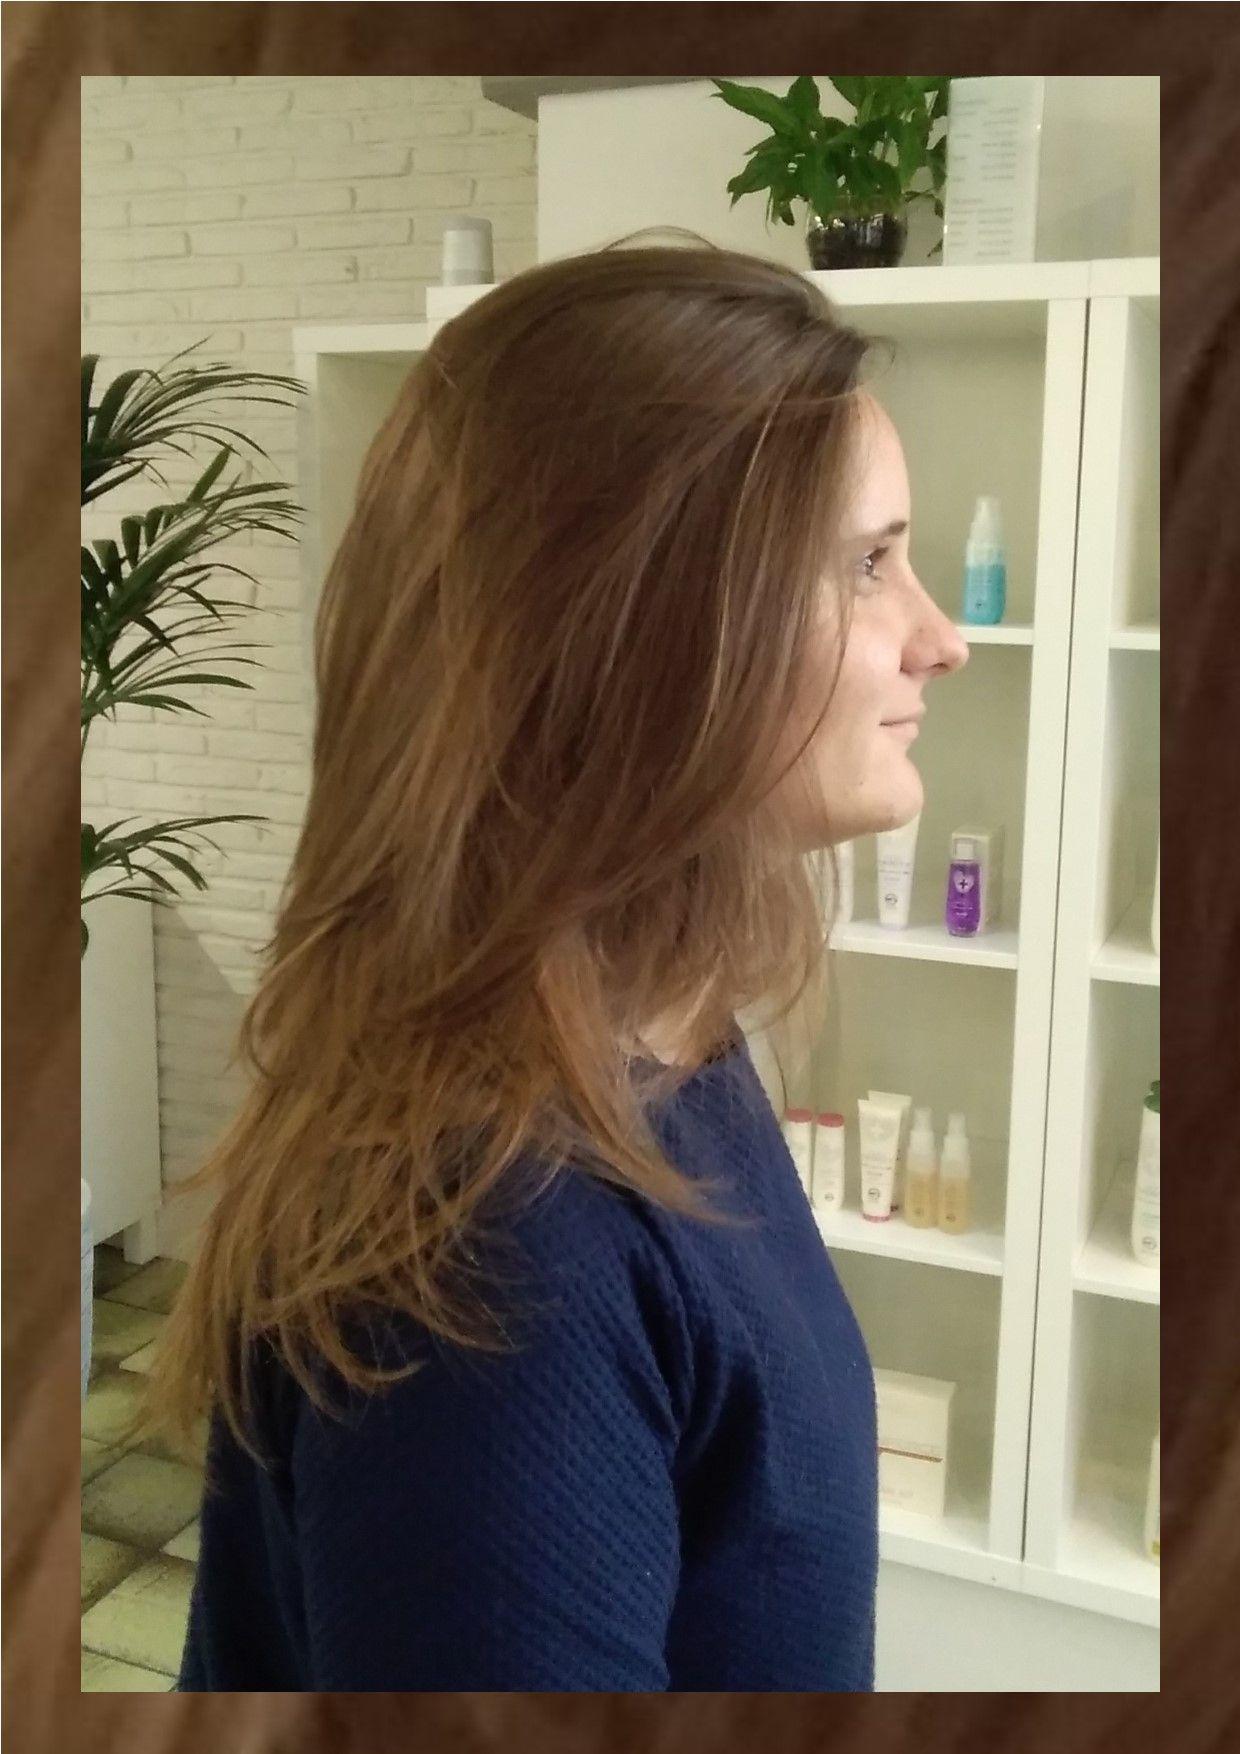 Haartrends 2020 Lang Haar In 2020 Lang Haar Opsteekkapsels Lang Haar Haar